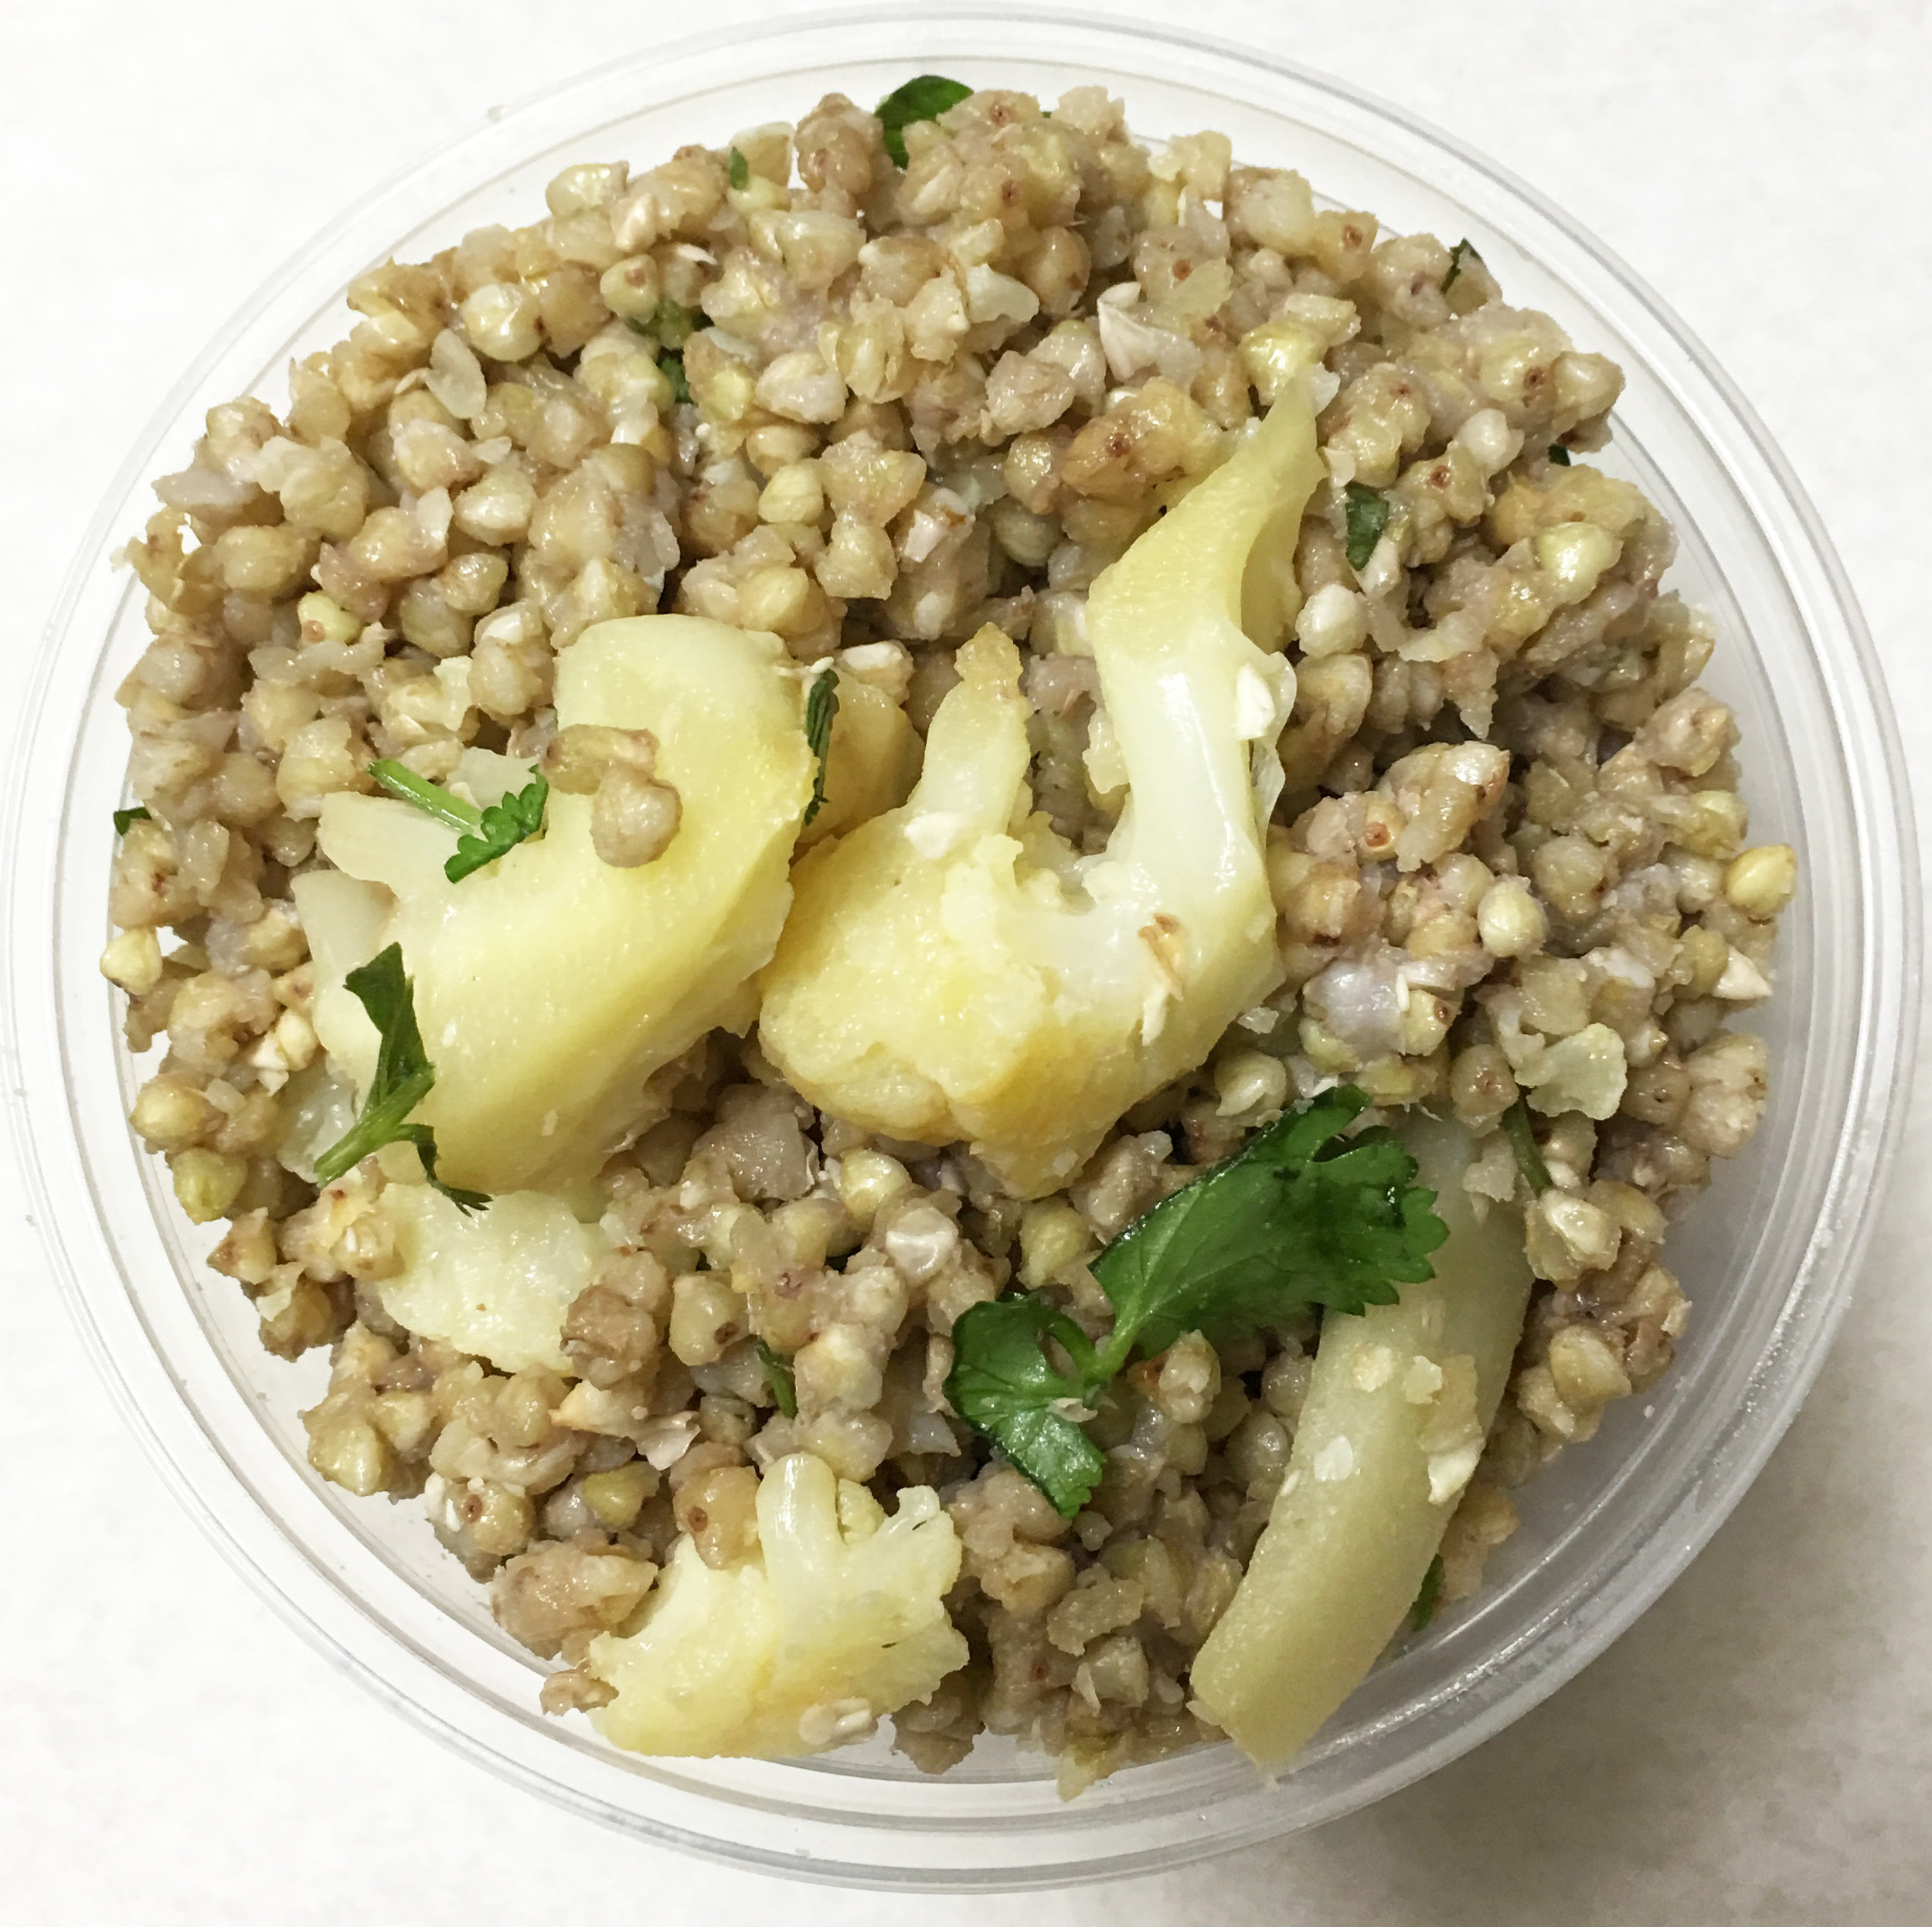 Buckwheat salad with cauliflower and parsley.